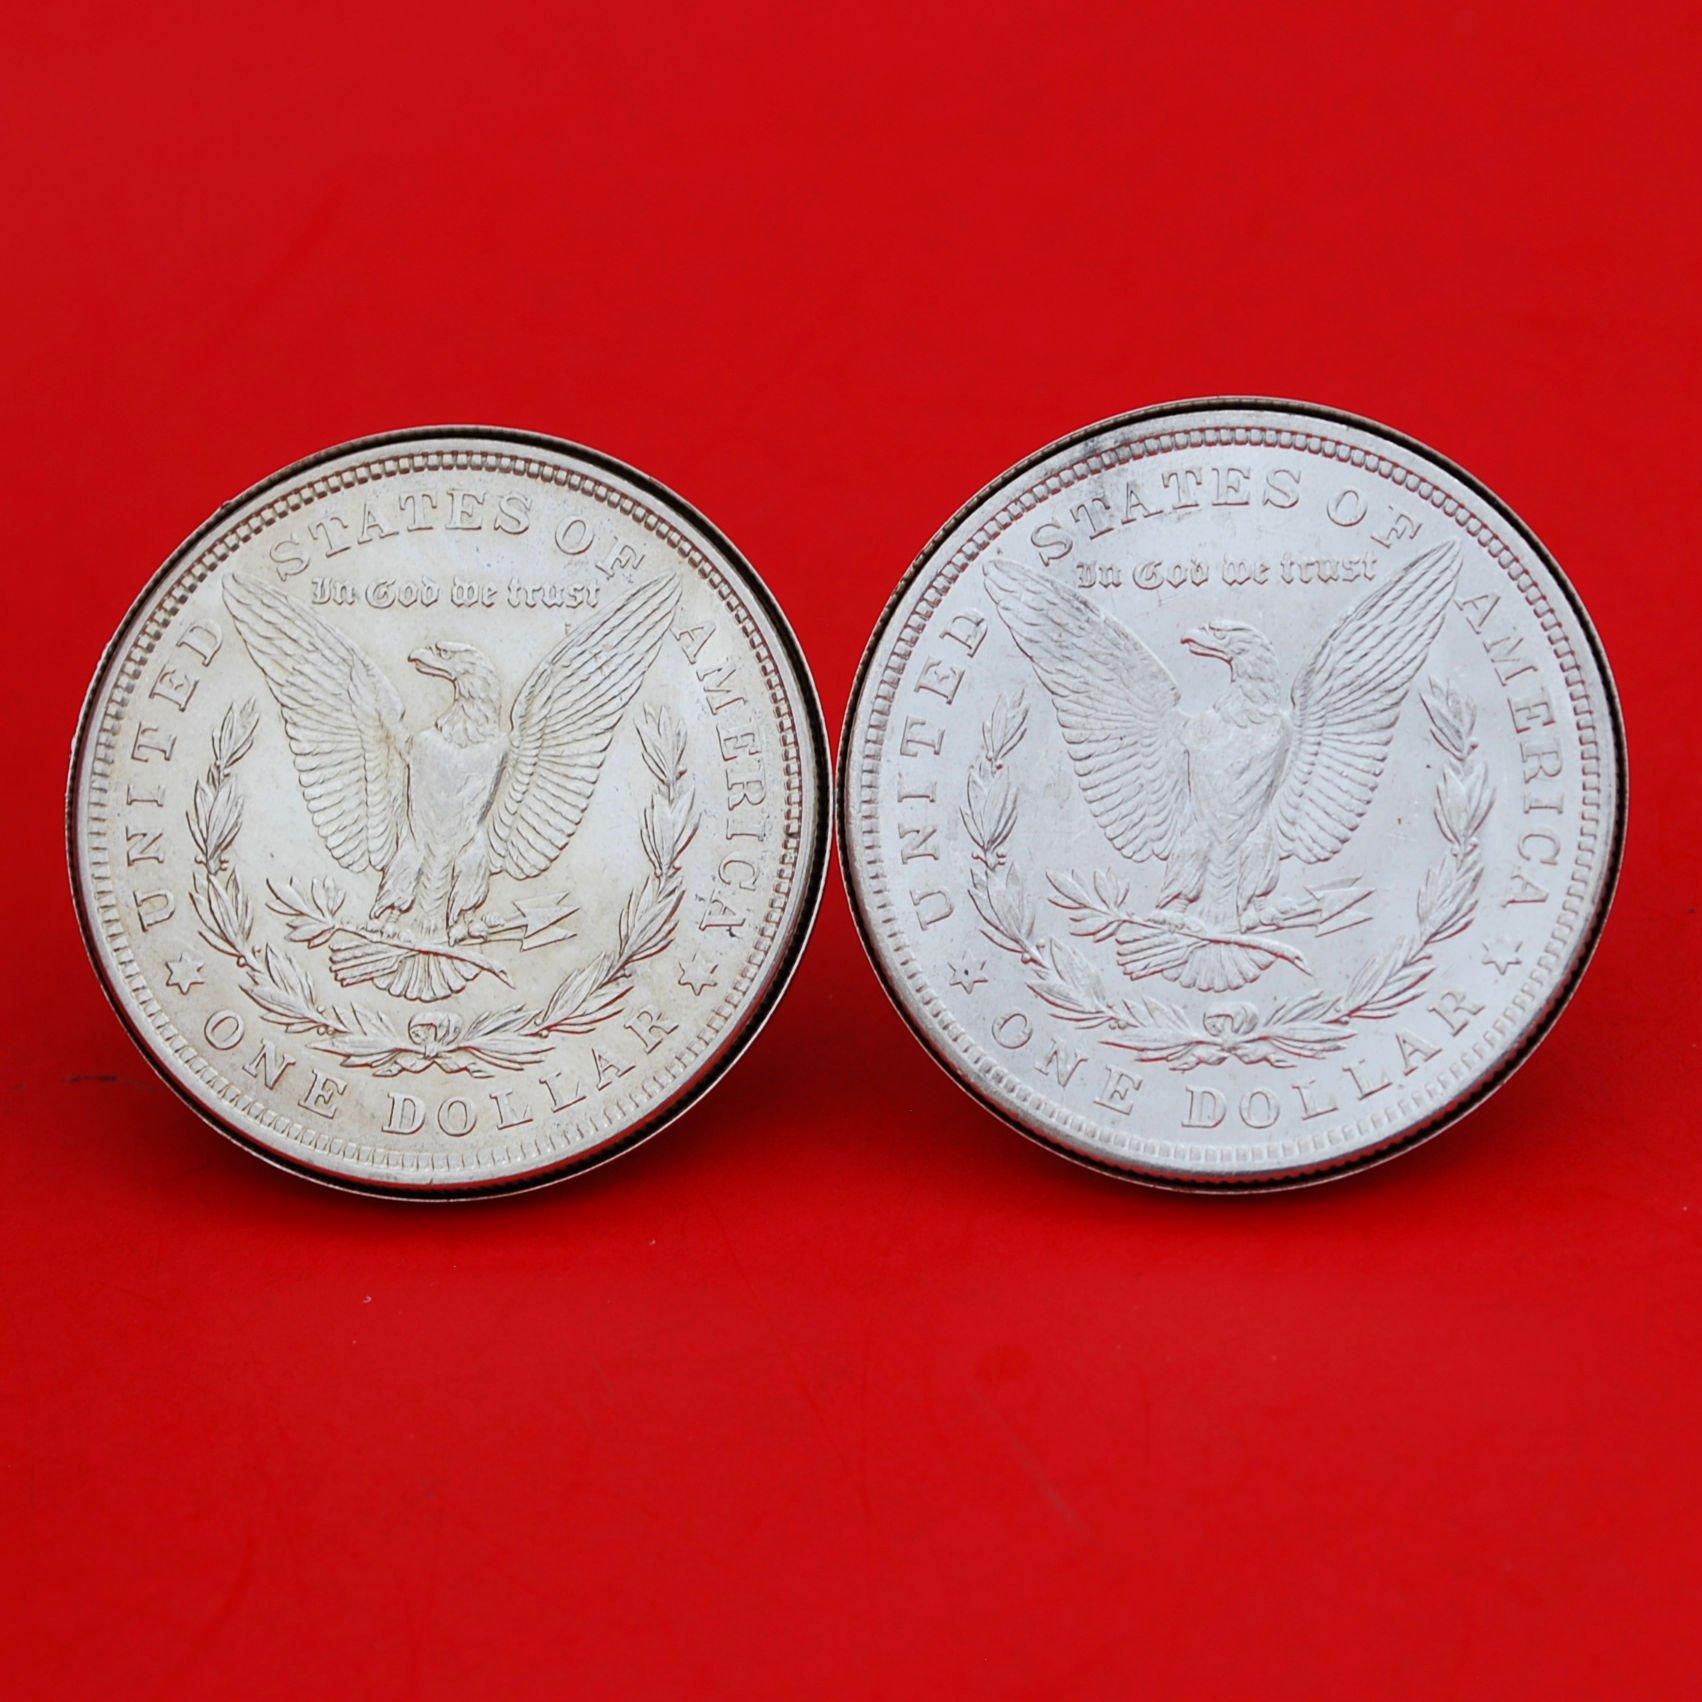 US 1921 Morgan Silver Dollar BU Uncirculated Silver Cufflinks NEW - REVERSE + REVERSE